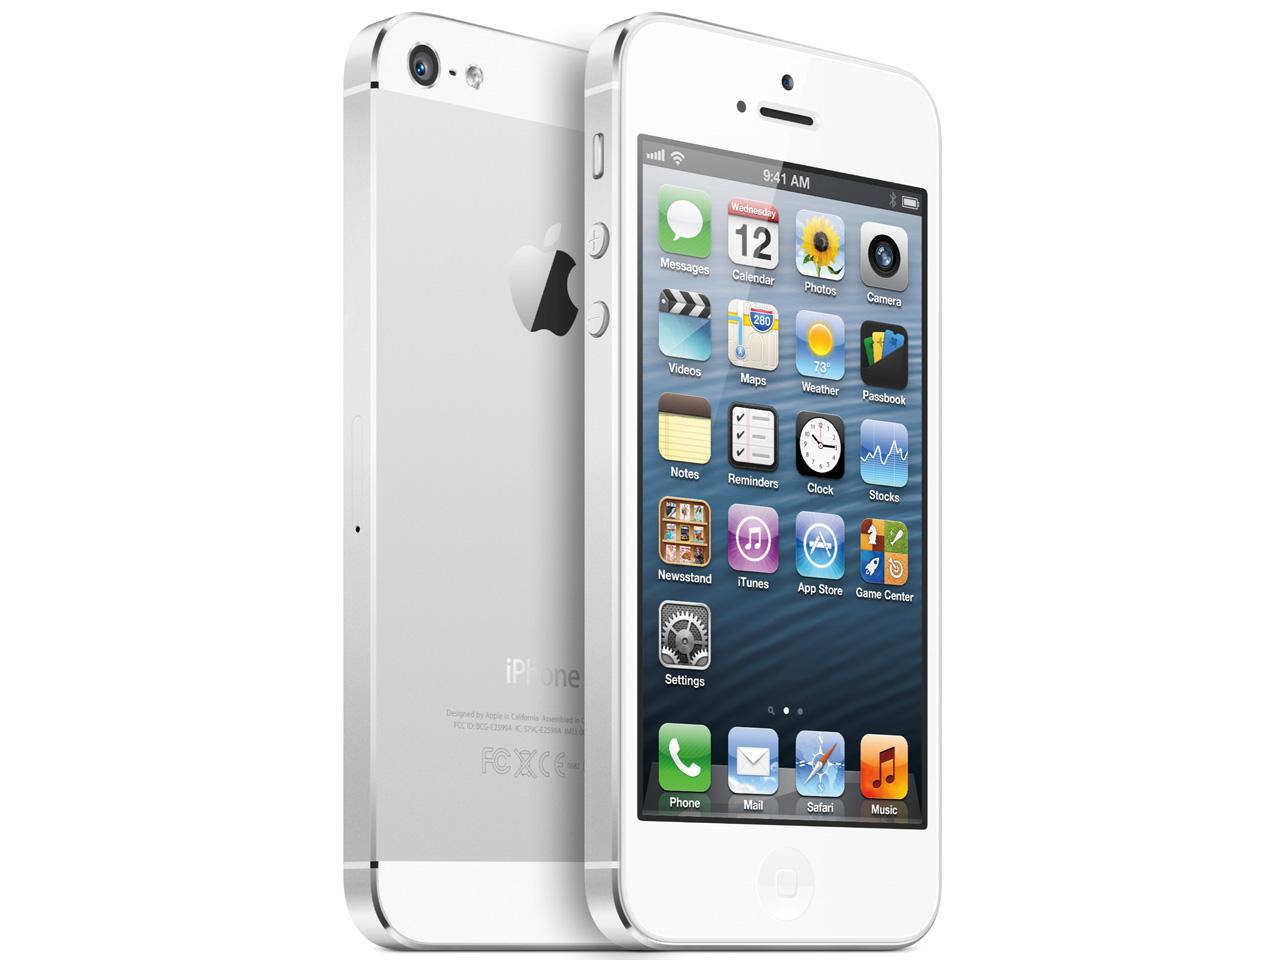 iPhone 5 16GB au [ホワイト&シルバー] の製品画像